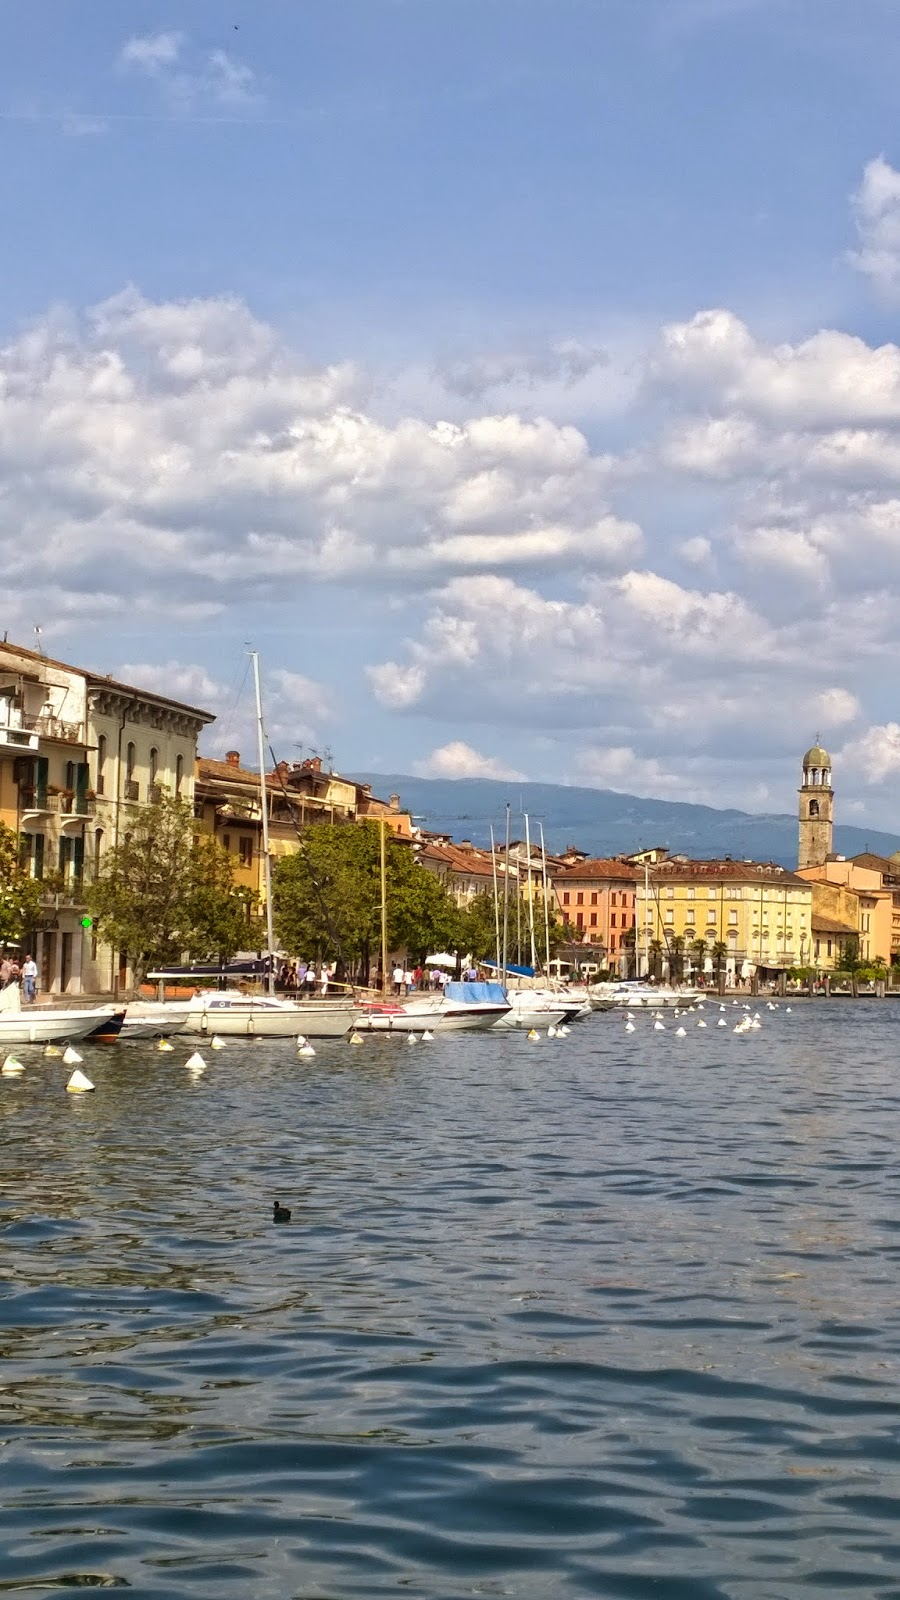 Lake promenade at Salò Lago di Garda, Lungo lago a Salò Lago di Garda